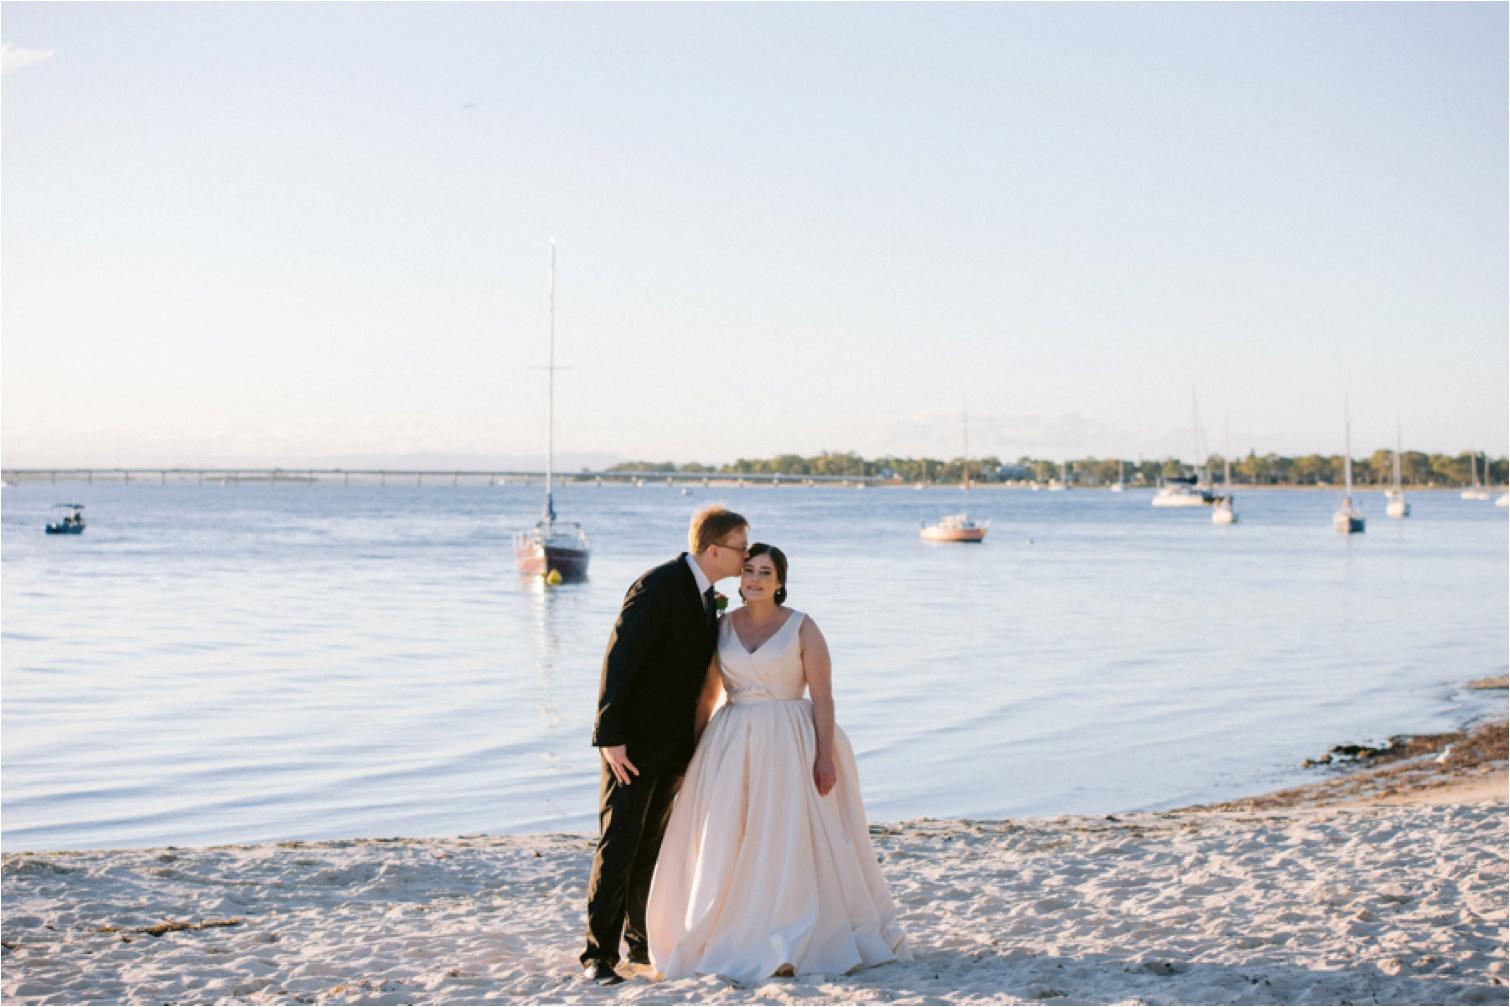 Bribie_Island_Beach_Wedding_Photography